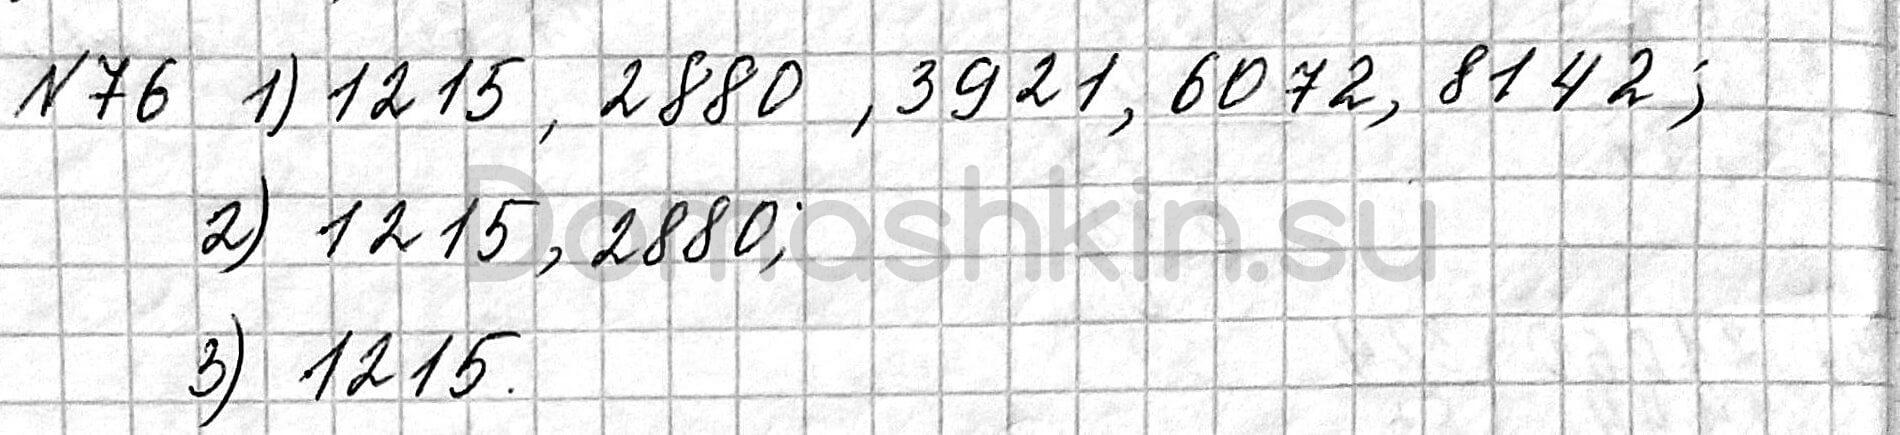 Математика 6 класс учебник Мерзляк номер 76 решение